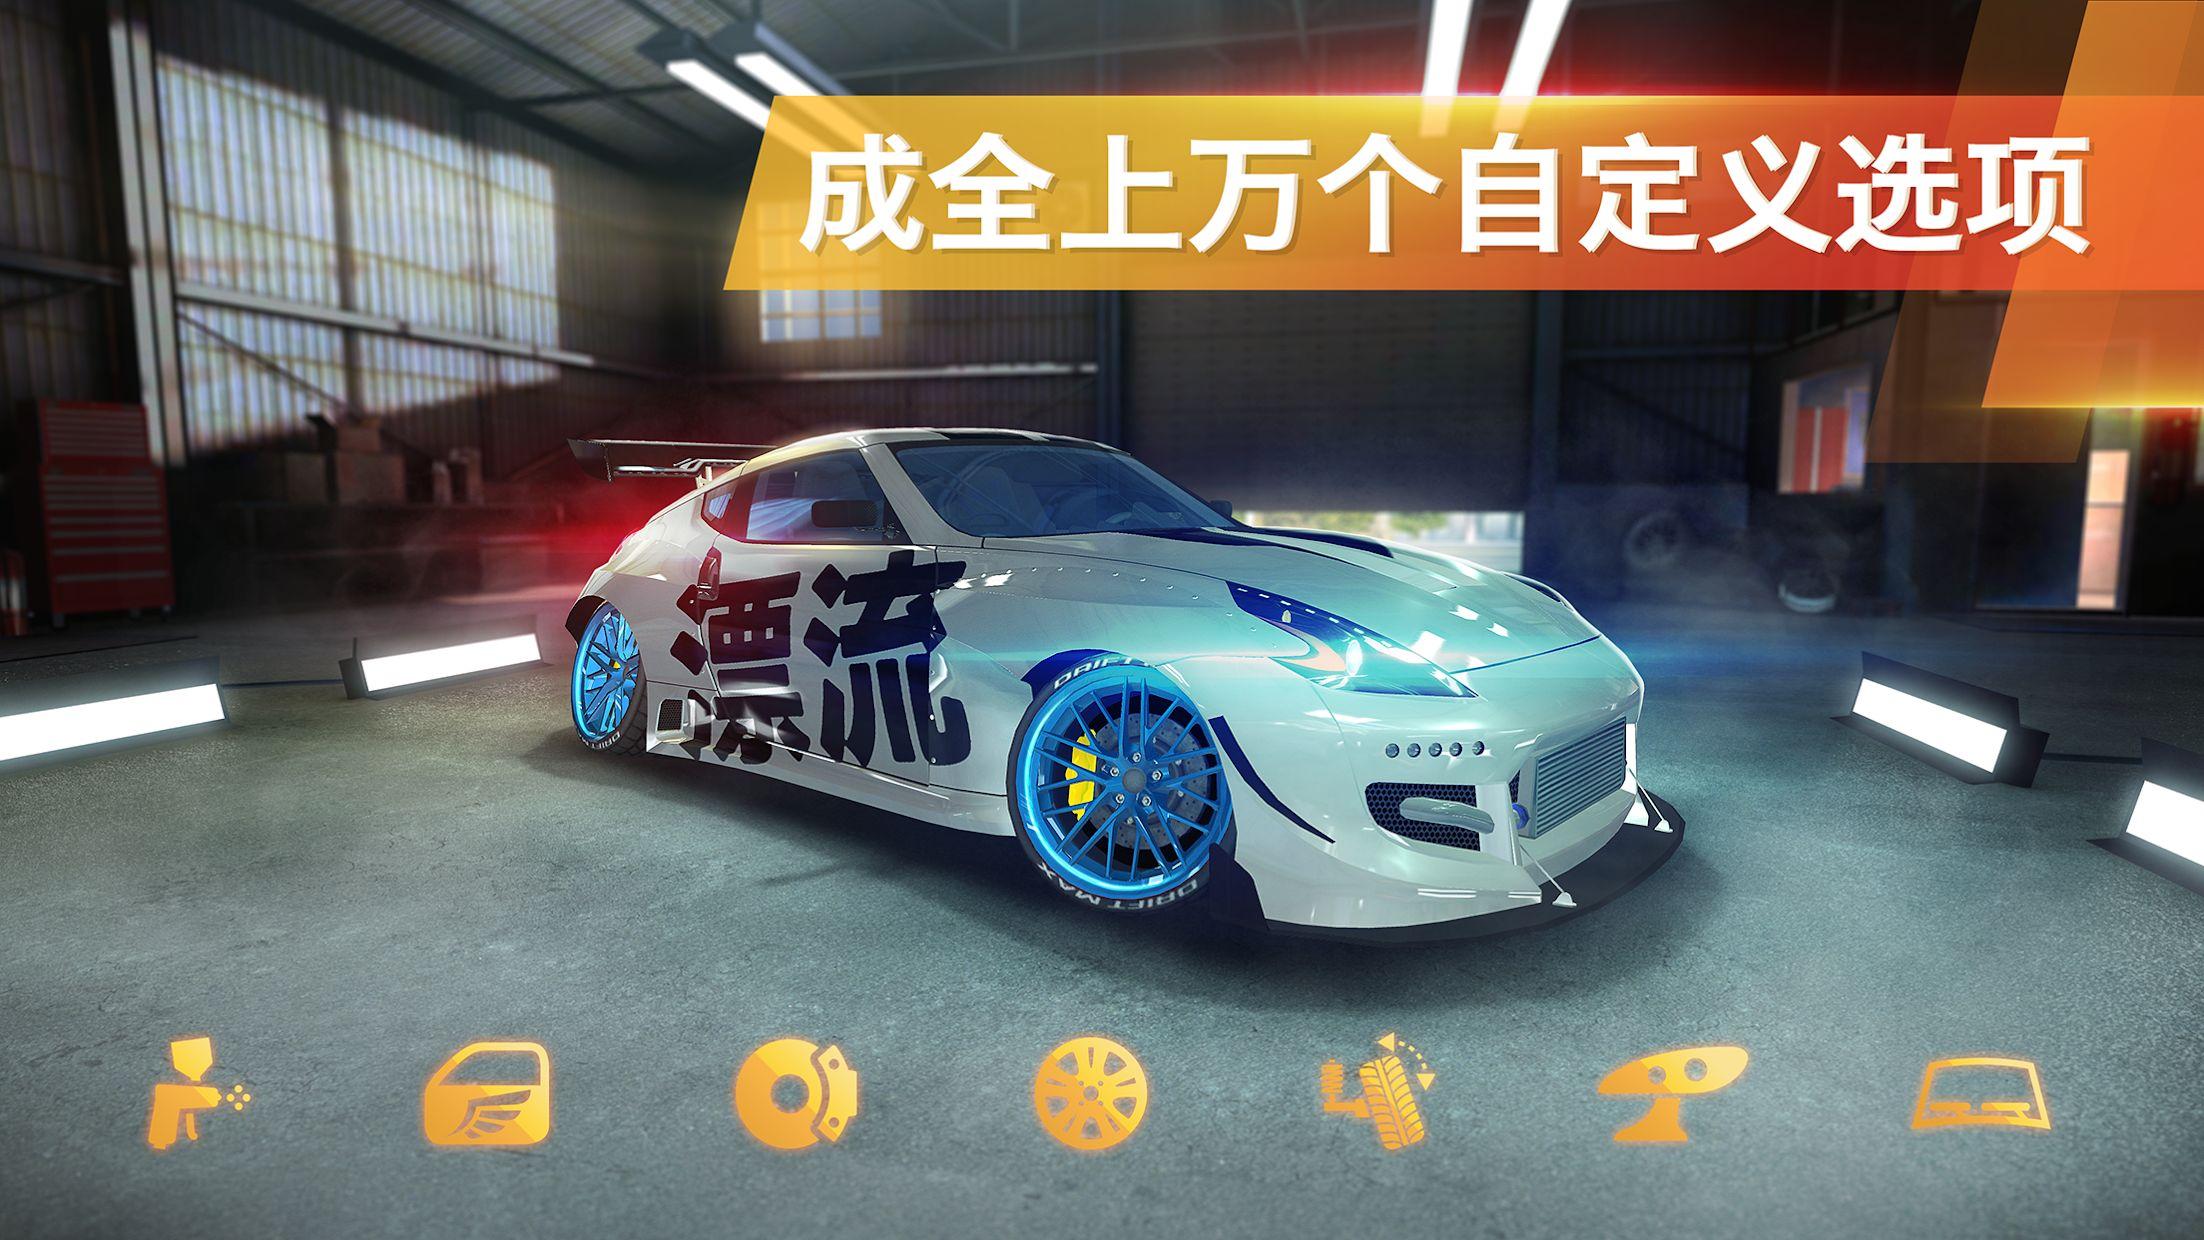 Drift Max Pro (极限漂移专家) - 赛车漂移游戏 游戏截图5